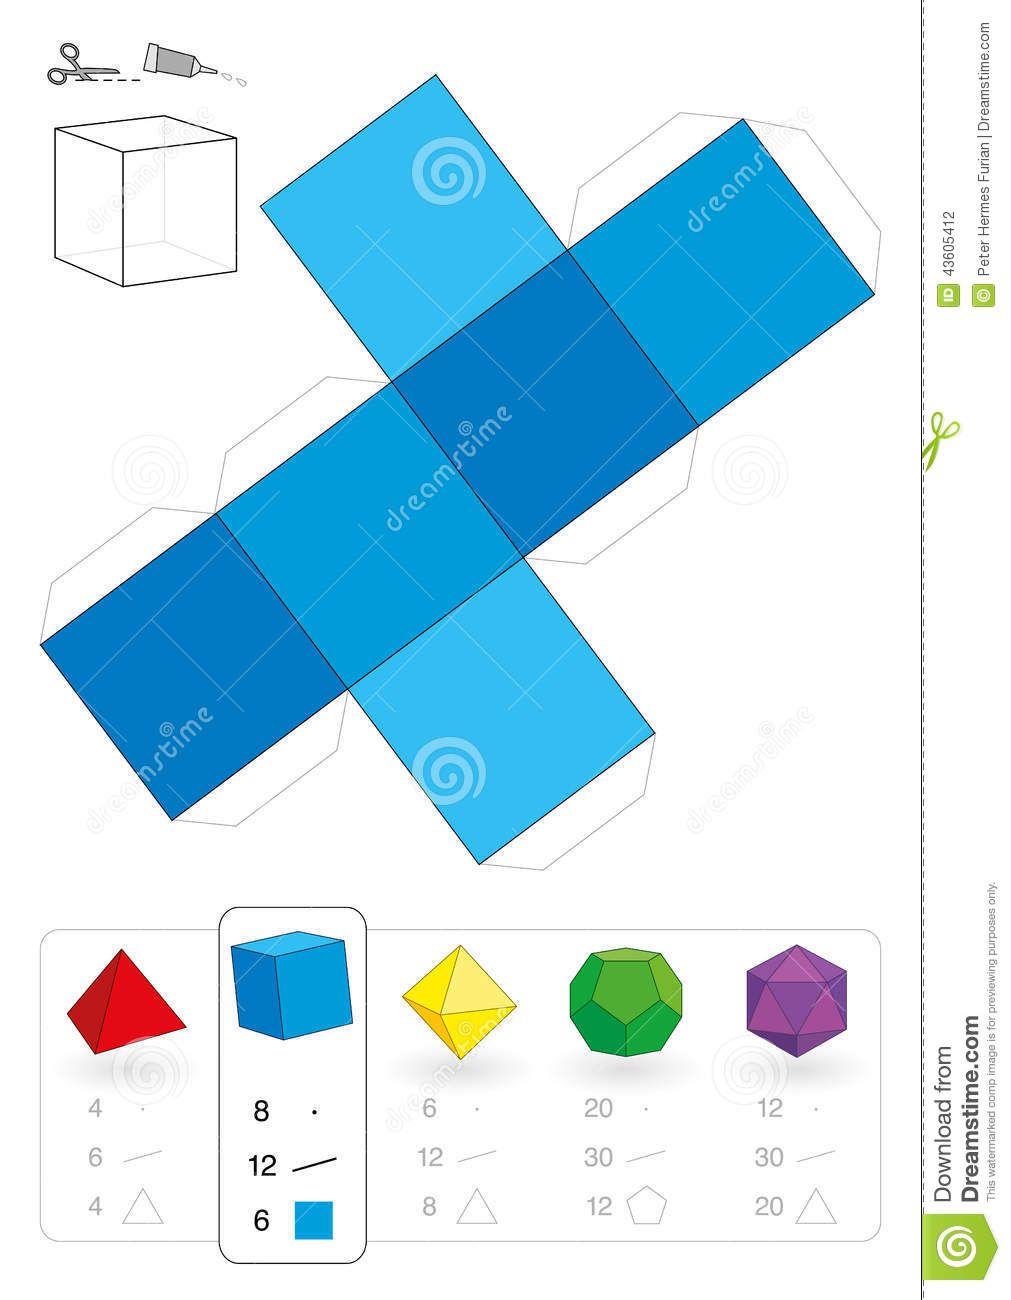 Manualidades Cubo Papel Figuras Geometricas Para Armar Cuerpos